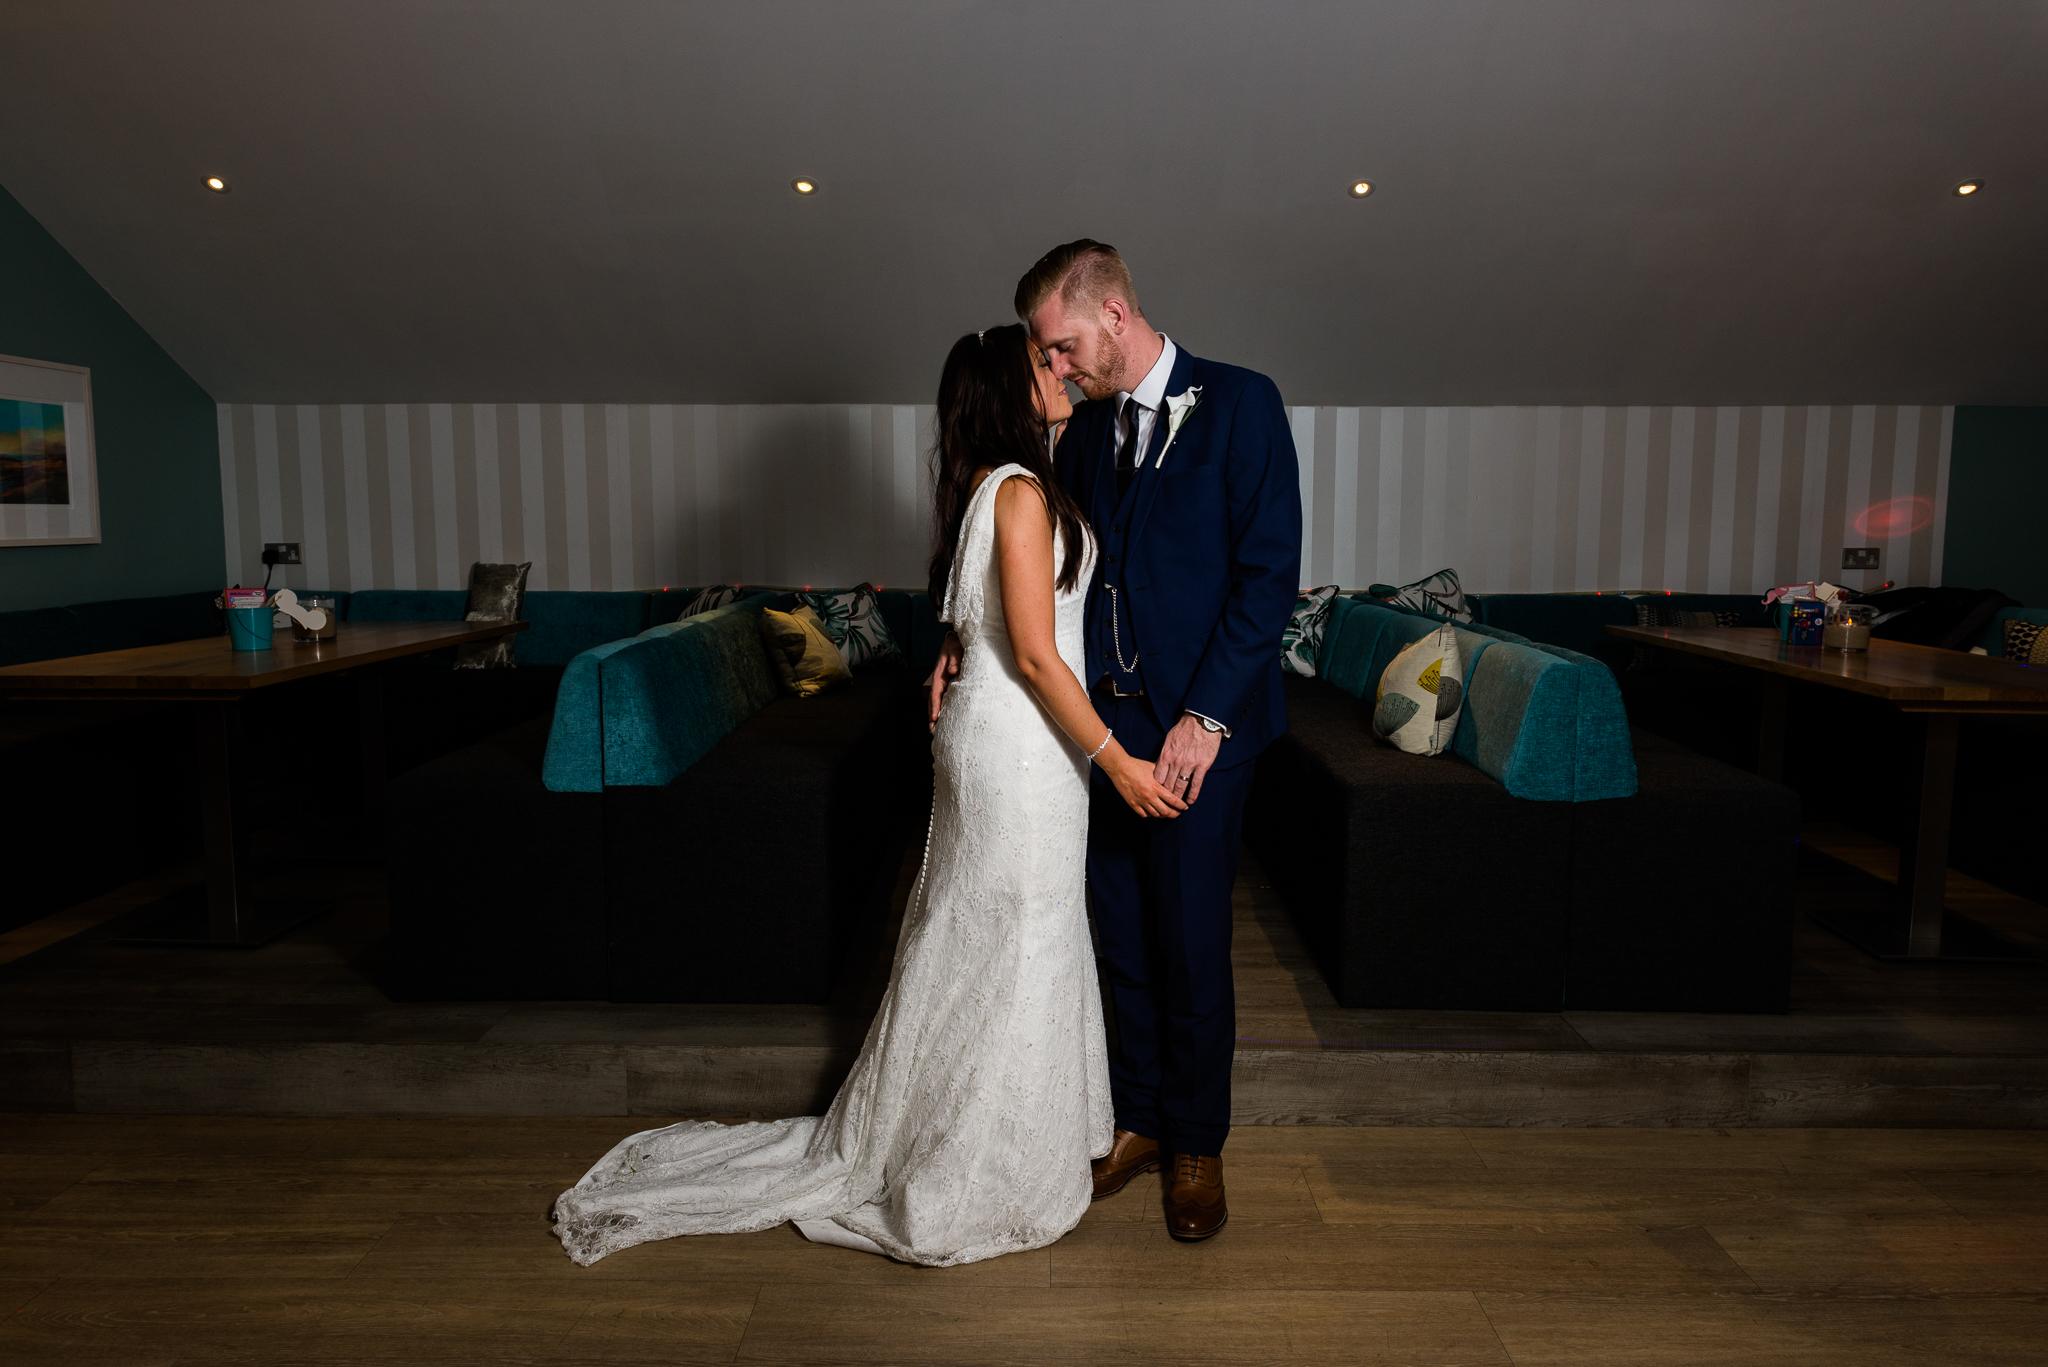 Destination Wedding Photography in Padstow, Cornwall at Retallack Resort-55.jpg